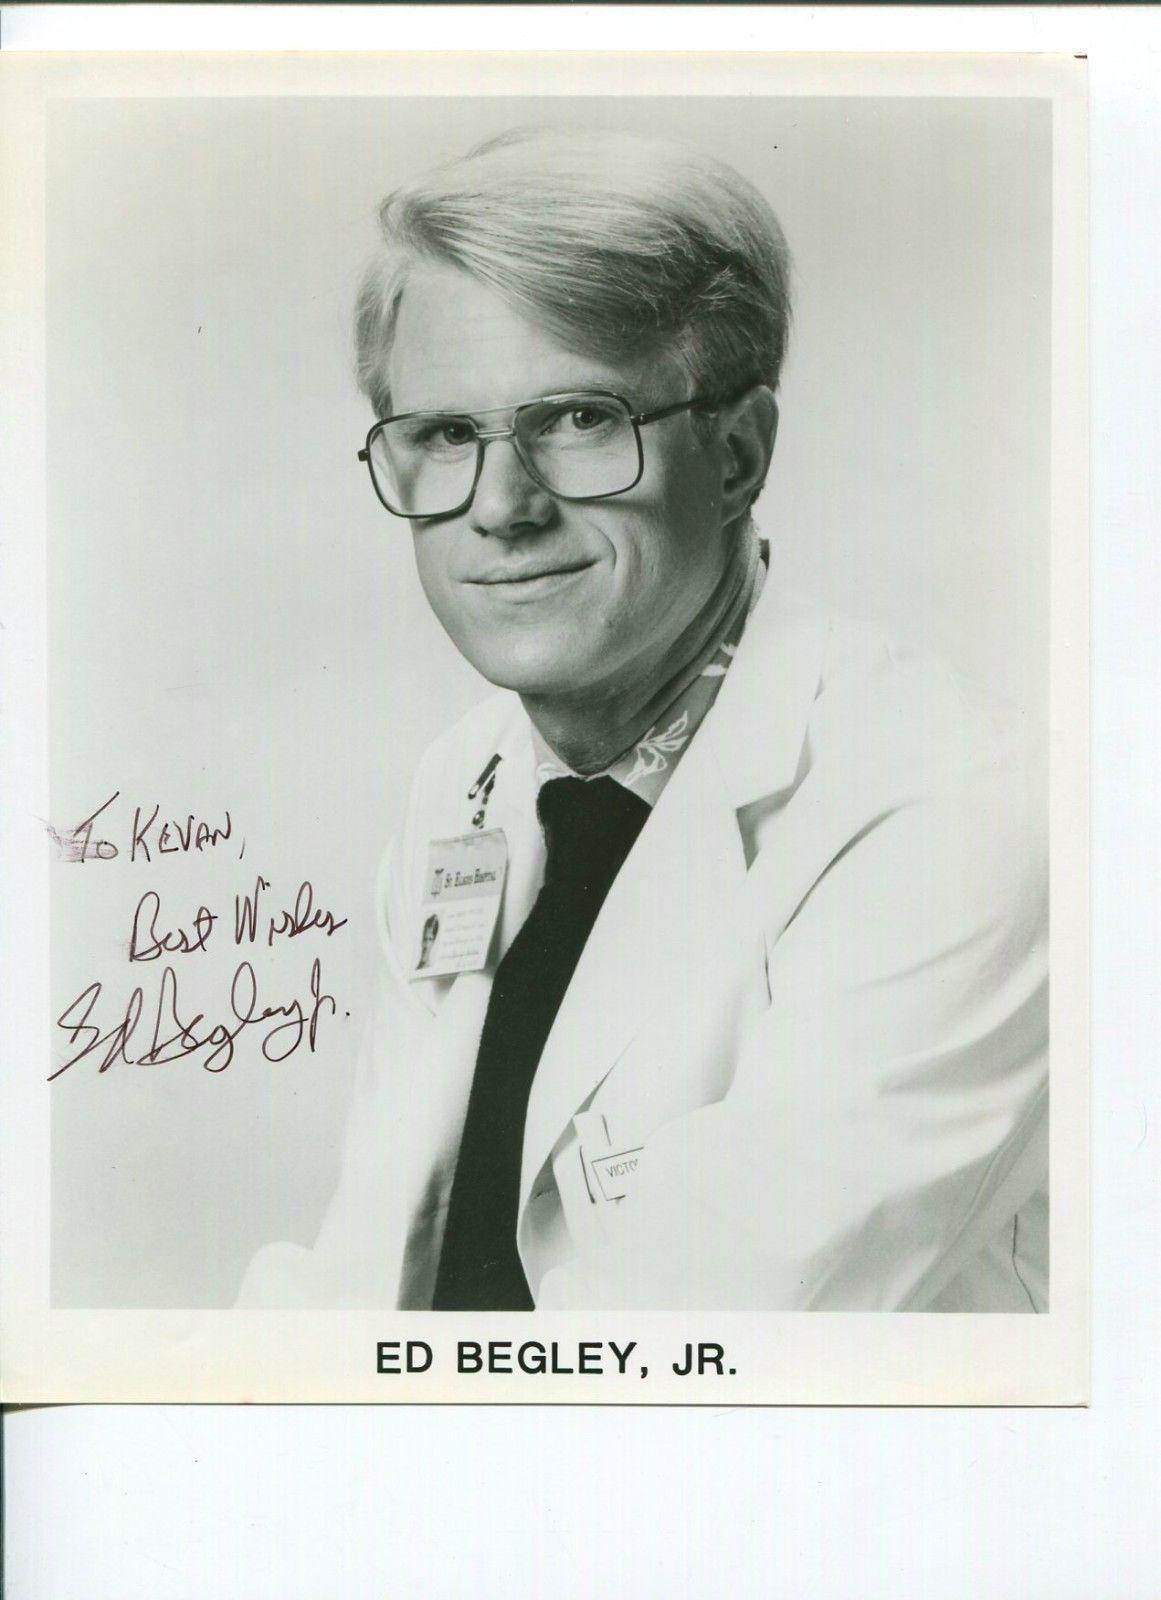 Ed Begley Jr Battlestar Galactica Spinal Tap St Elsewhere Signed ...